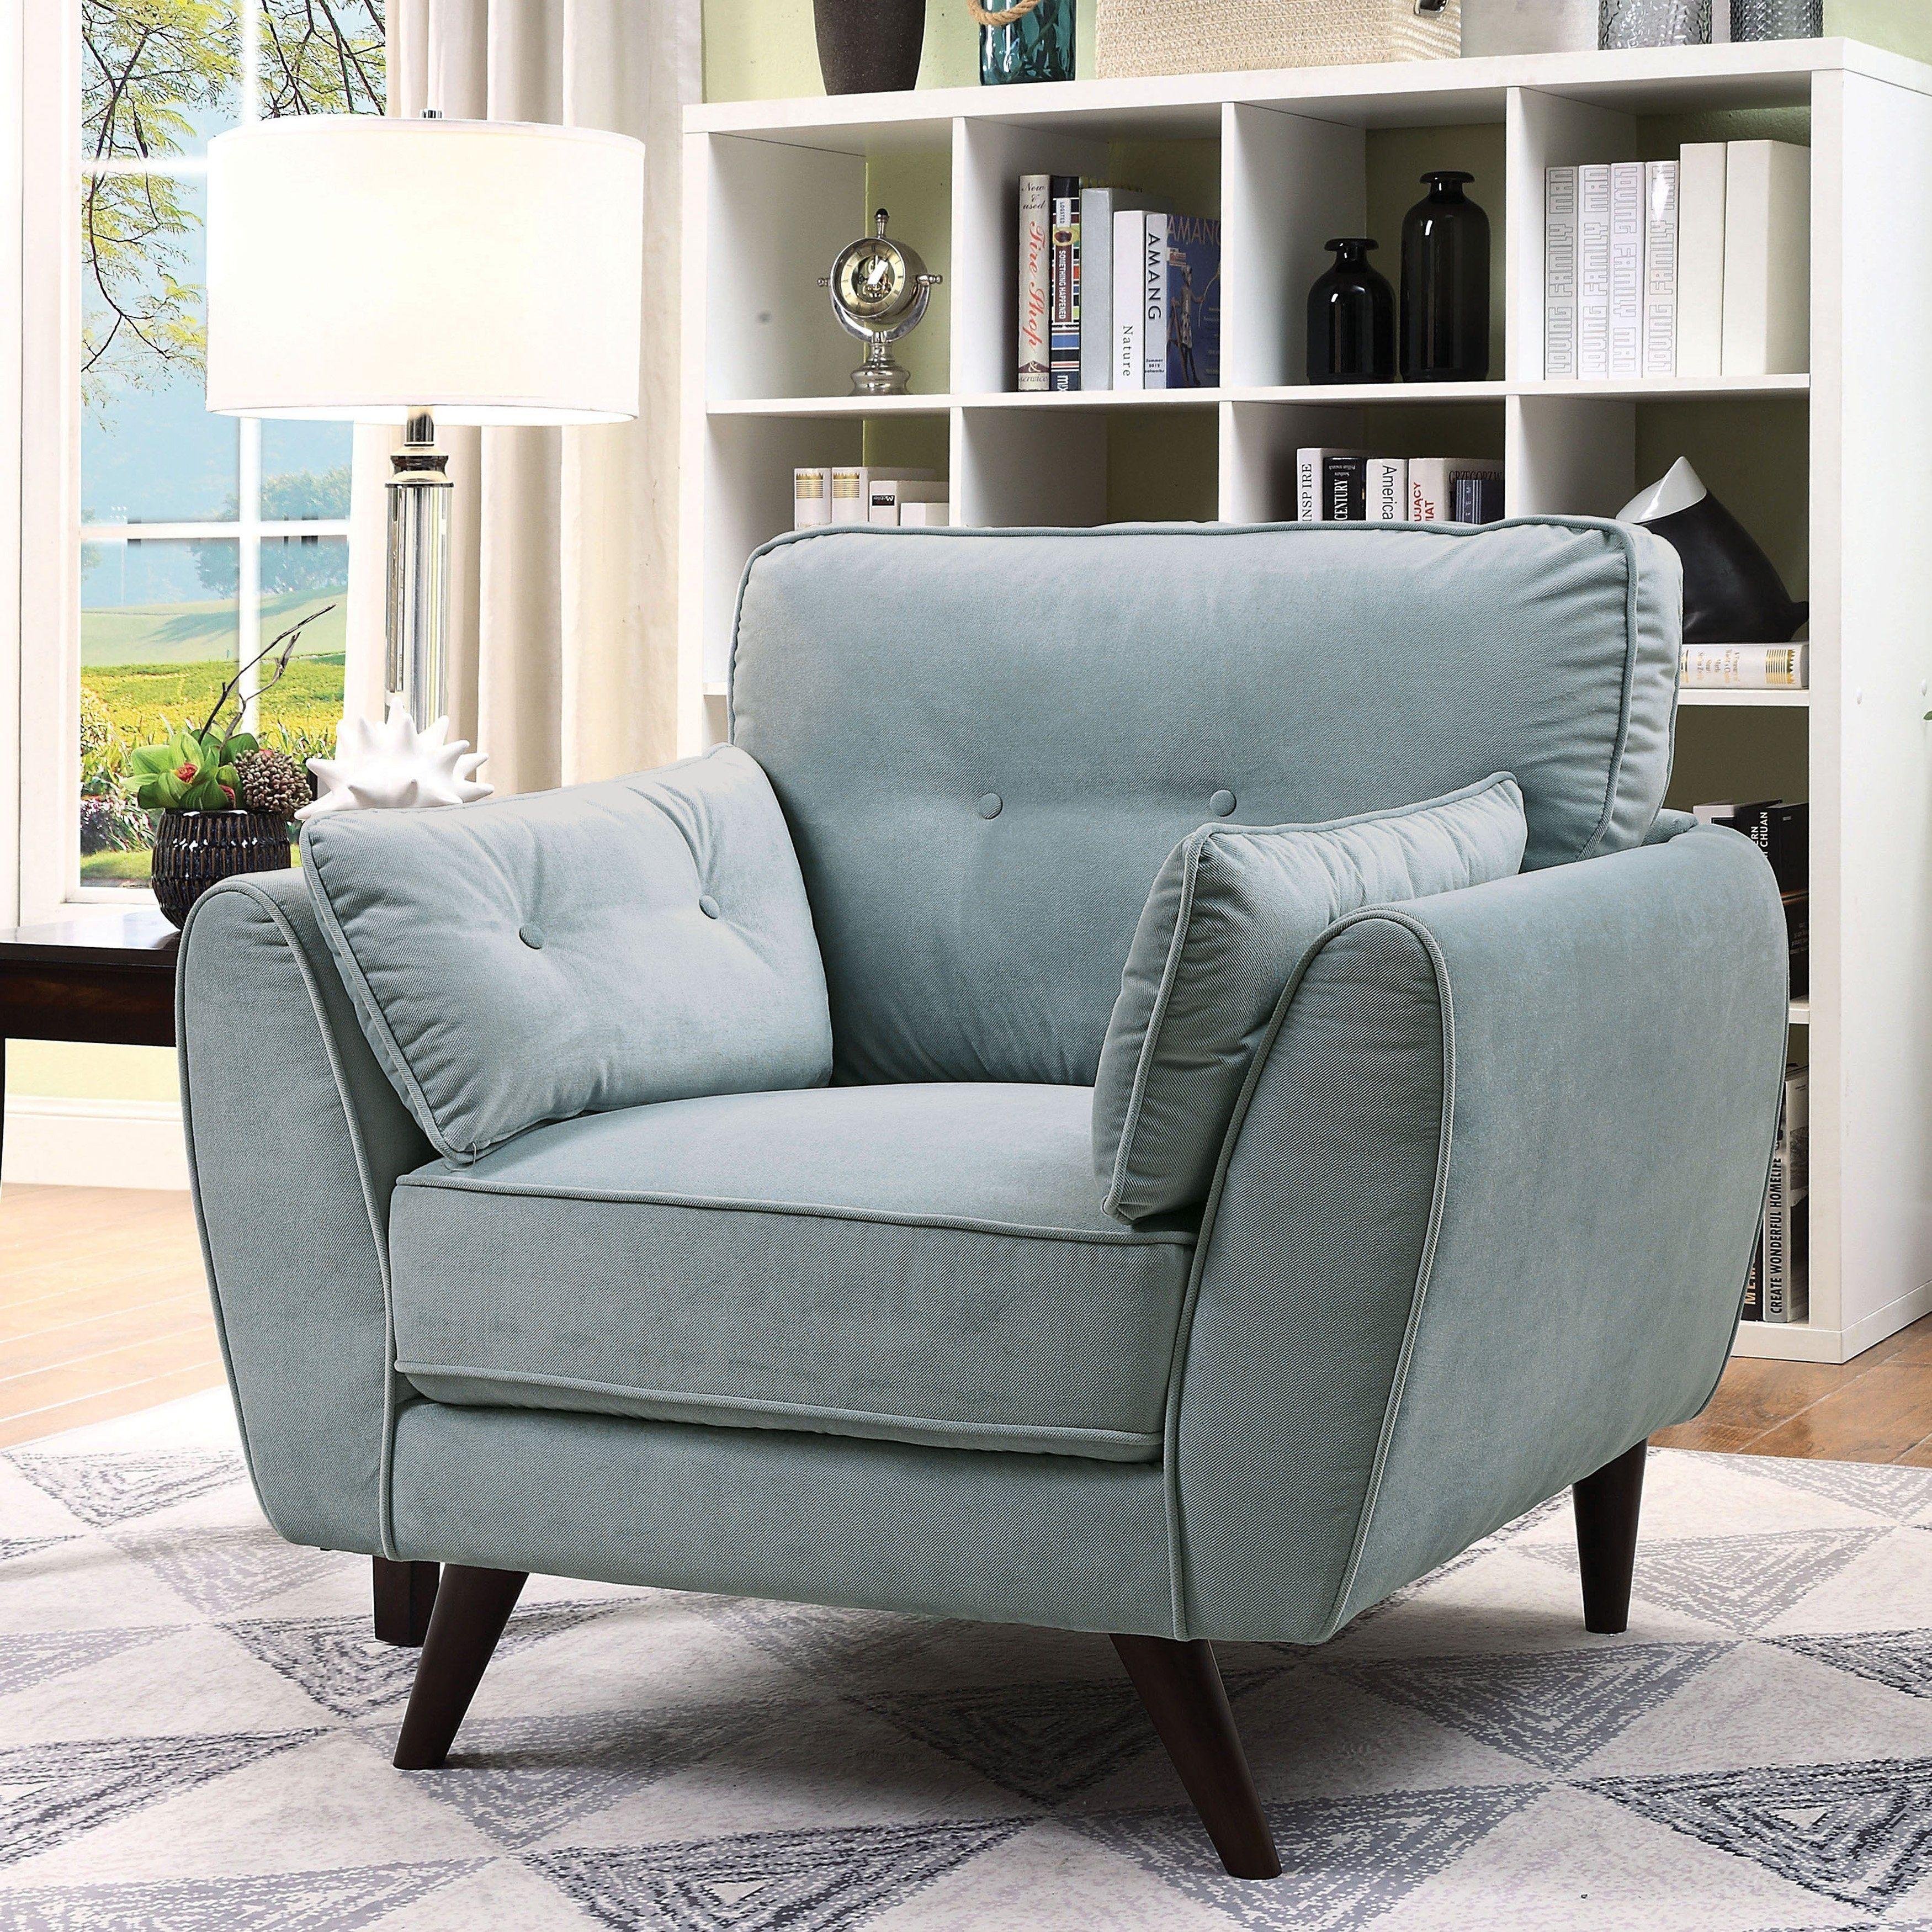 Best Furniture Of America Ahn Mid Century Modern Light Teal 400 x 300